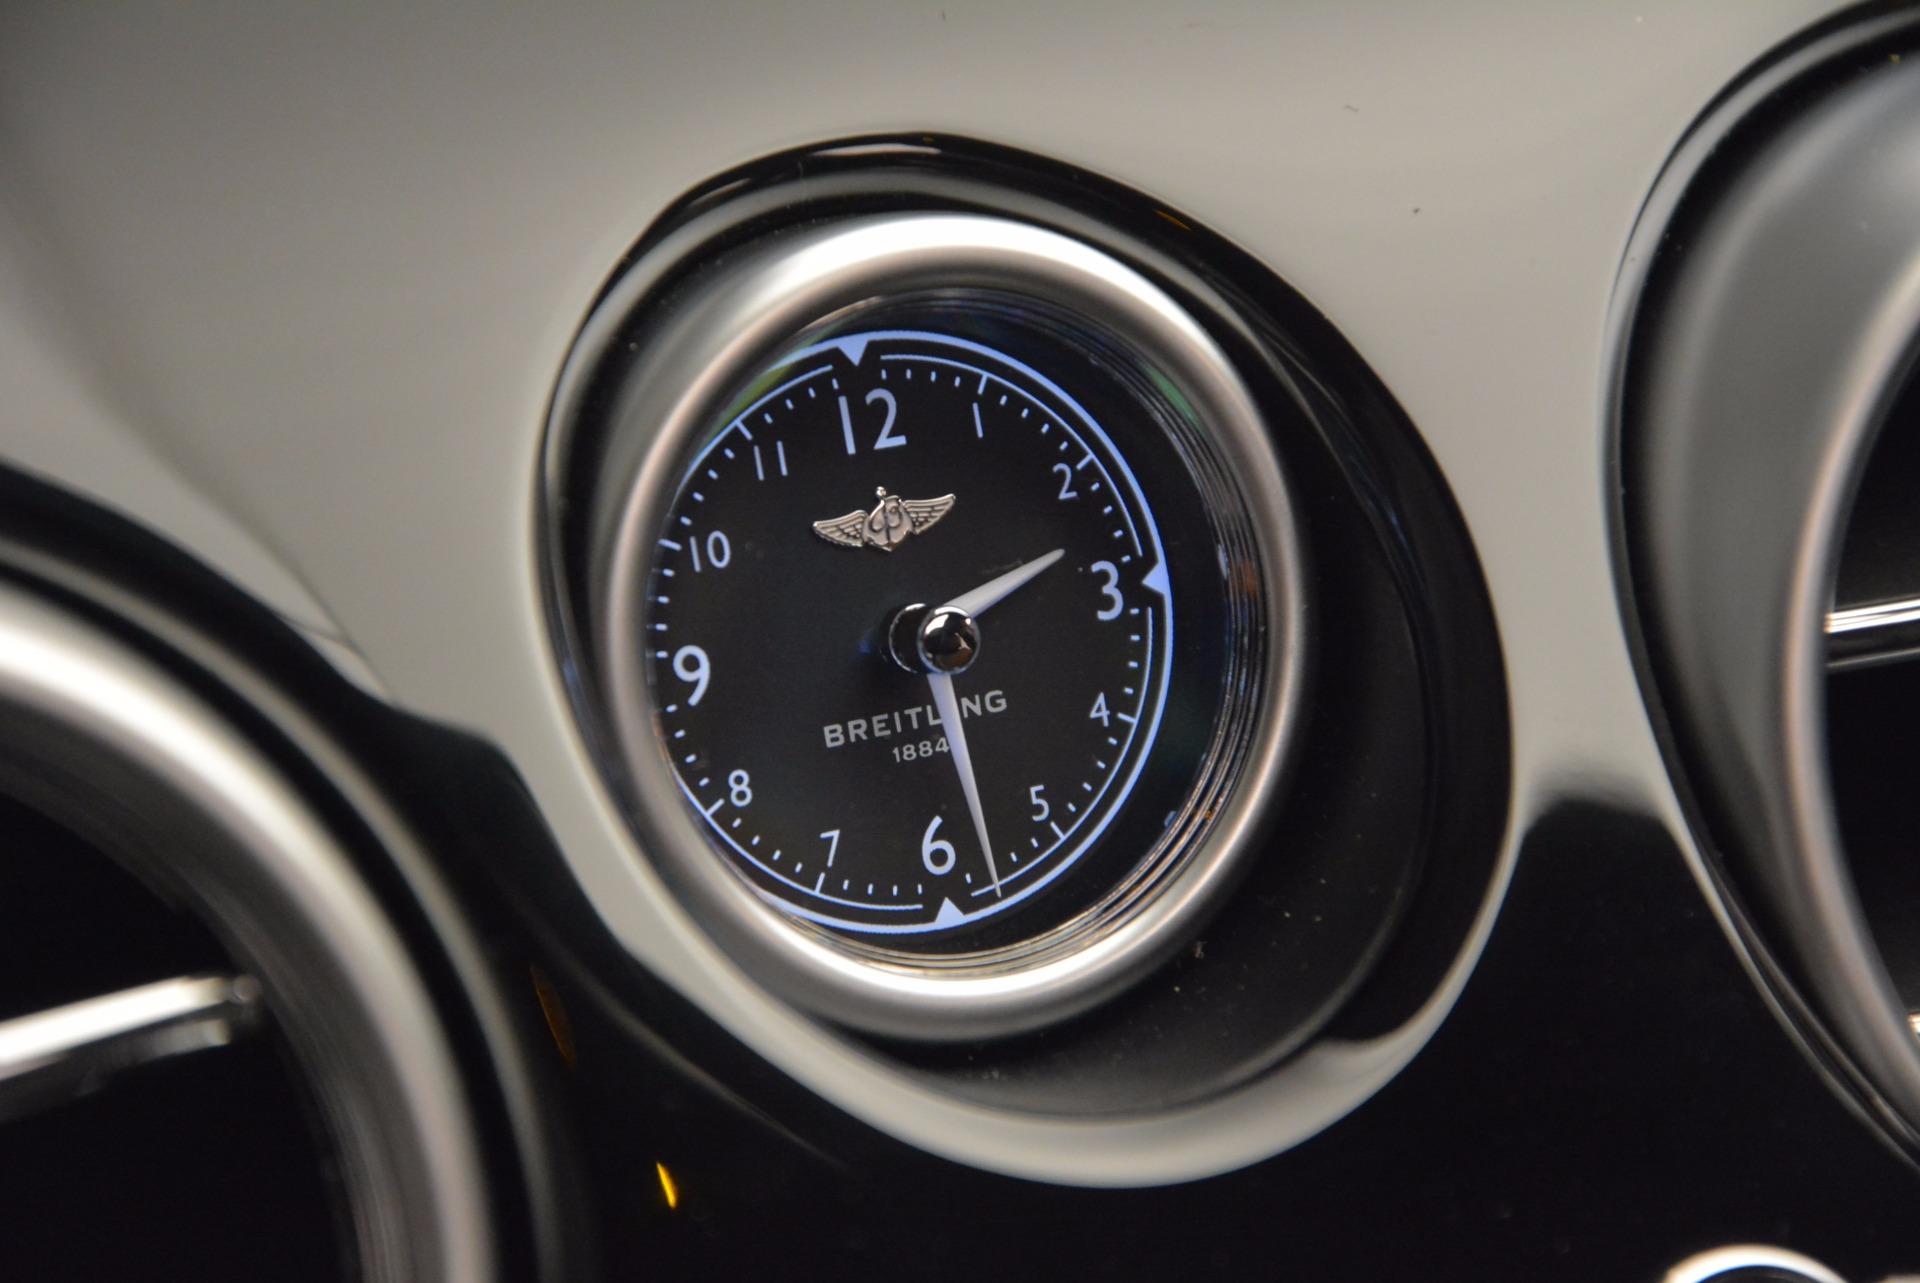 Used 2017 Bentley Flying Spur V8 S For Sale In Westport, CT 732_p30